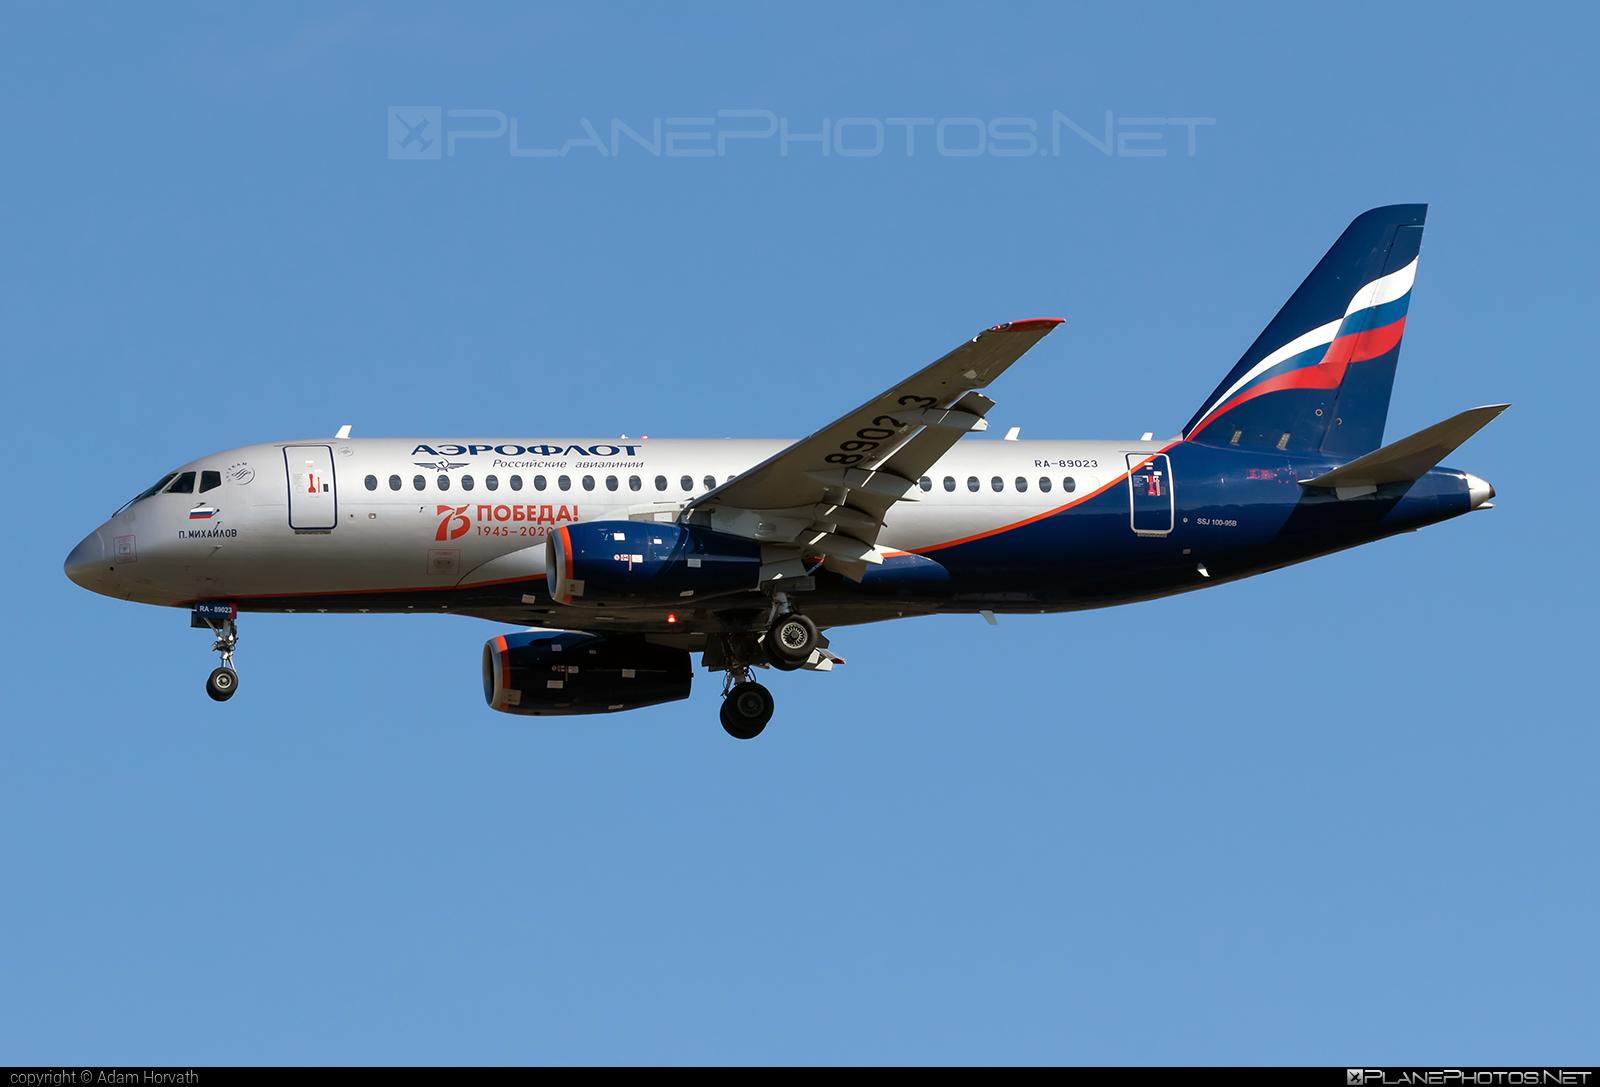 Sukhoi SSJ 100-95B Superjet - RA-89023 operated by Aeroflot #aeroflot #ssj100 #ssj10095b #sukhoi #sukhoisuperjet #superjet